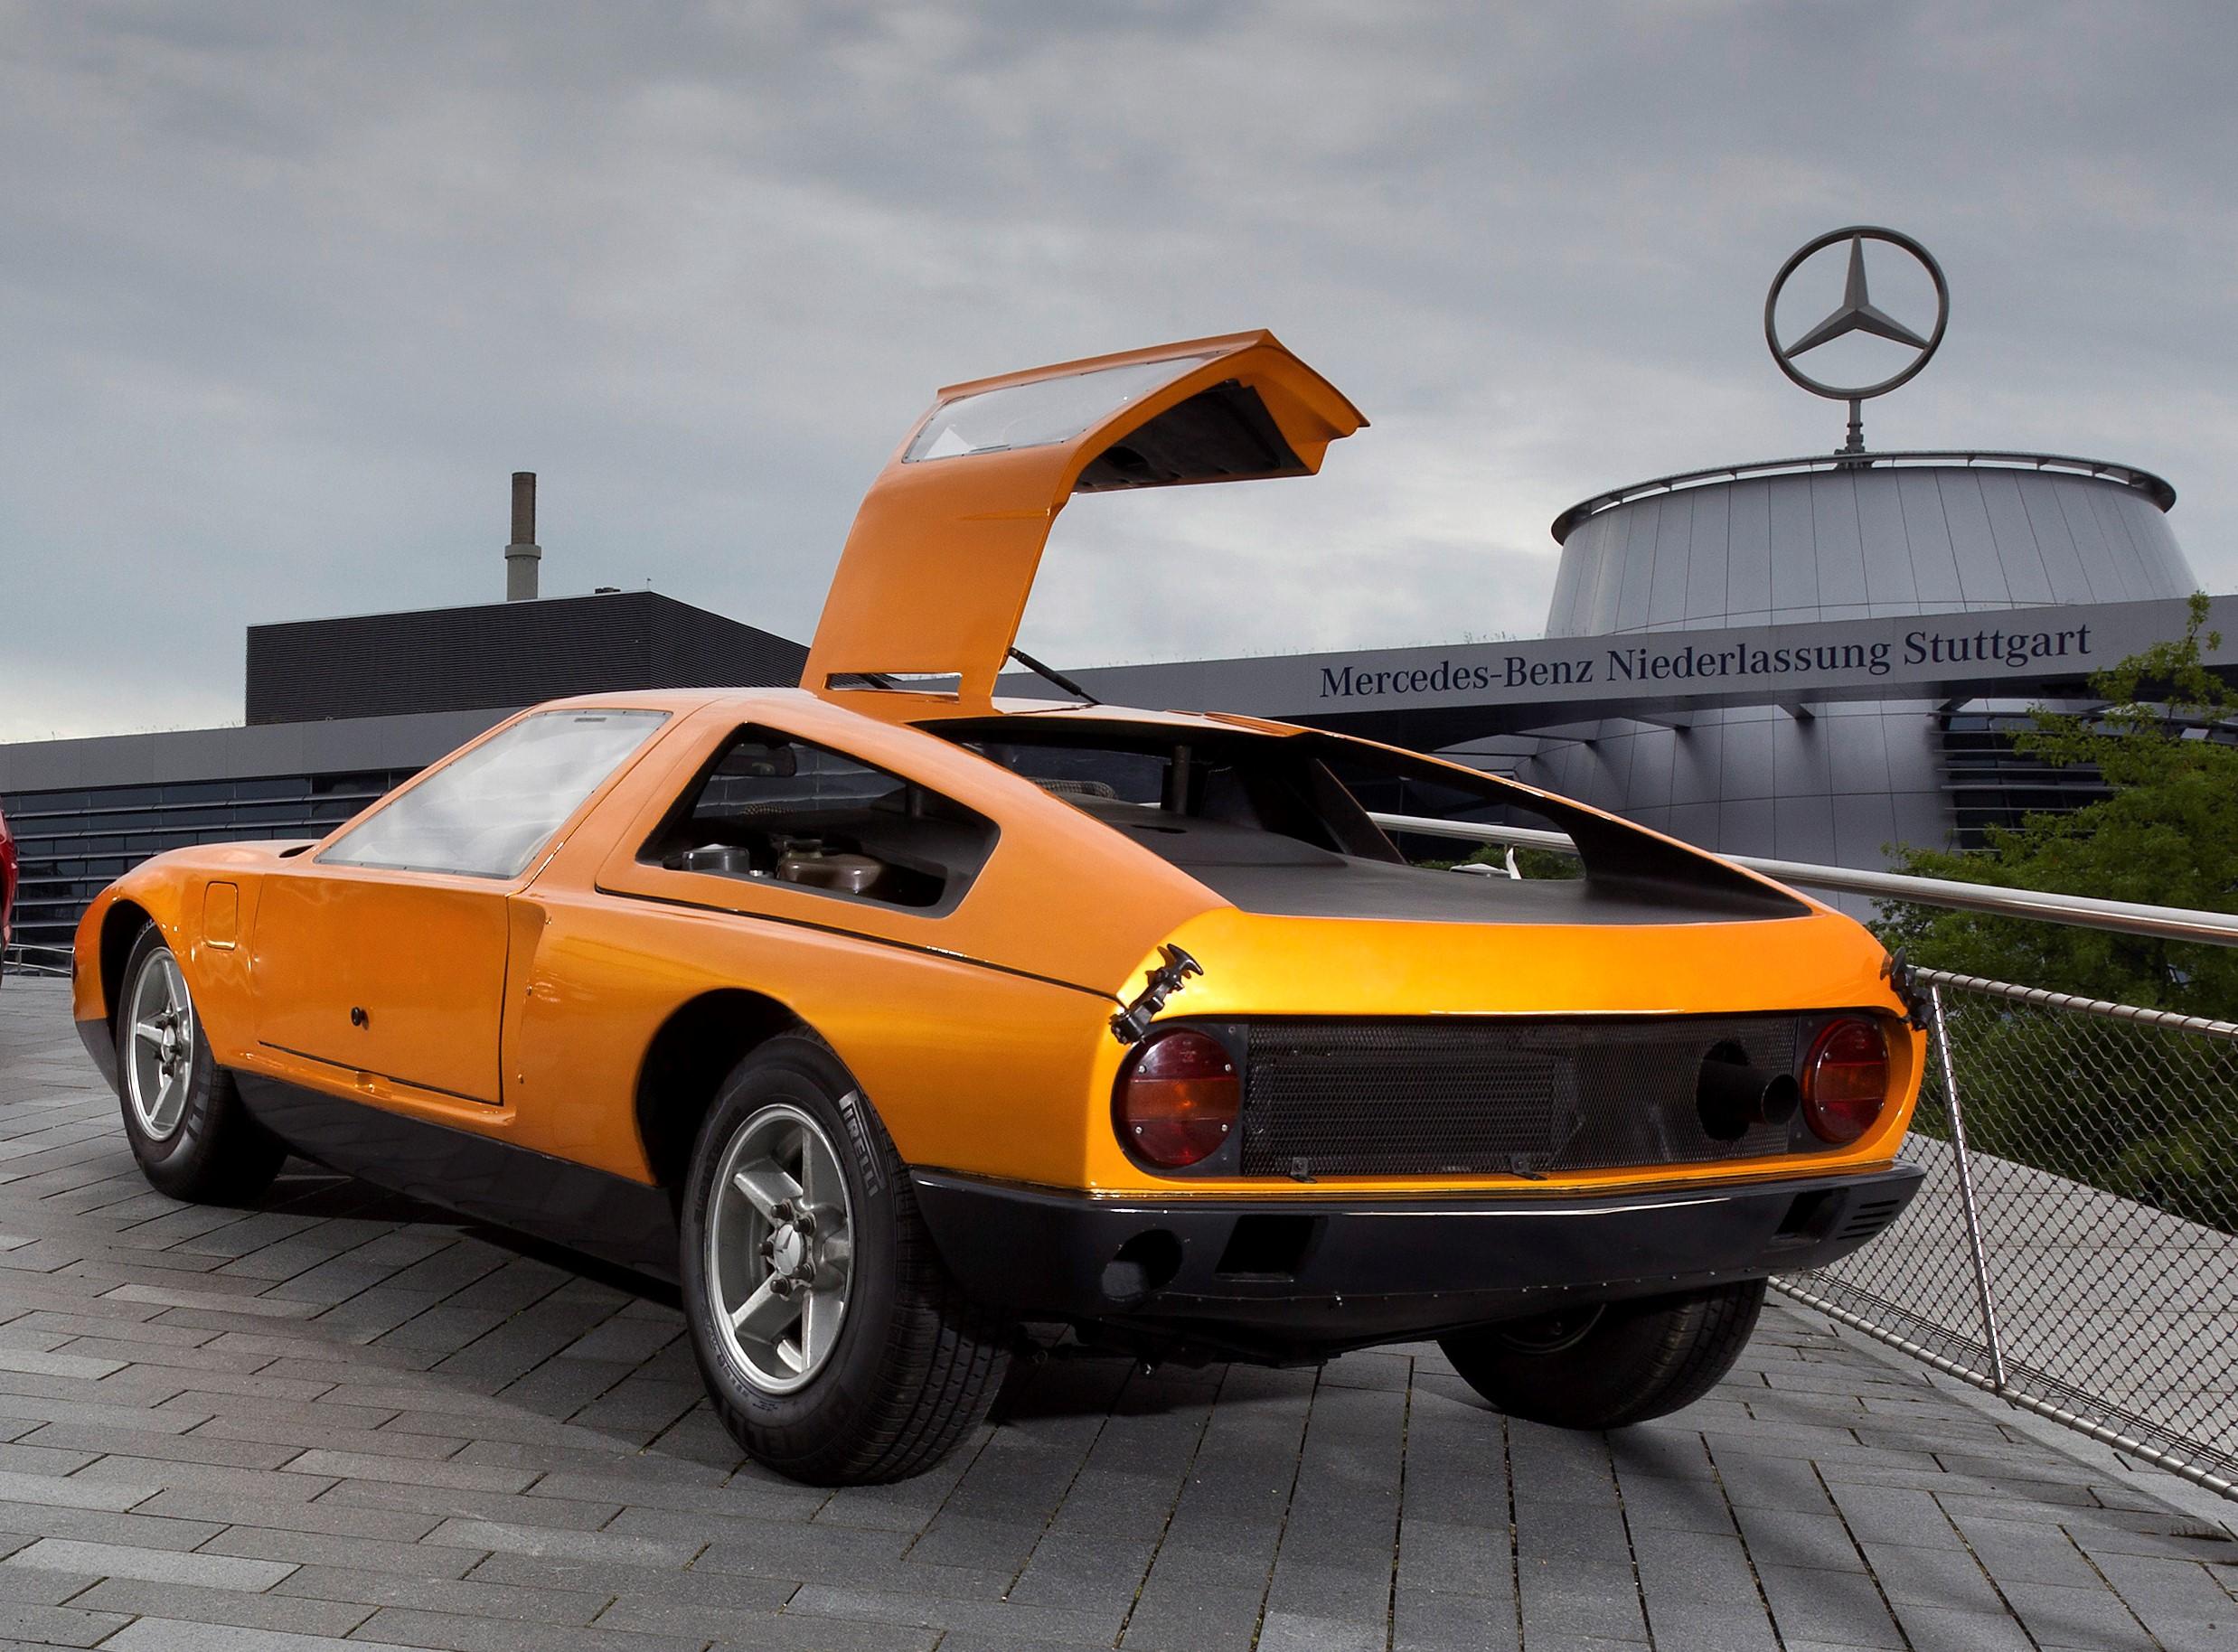 1970 Mercedes-Benz C 111-II full rear view